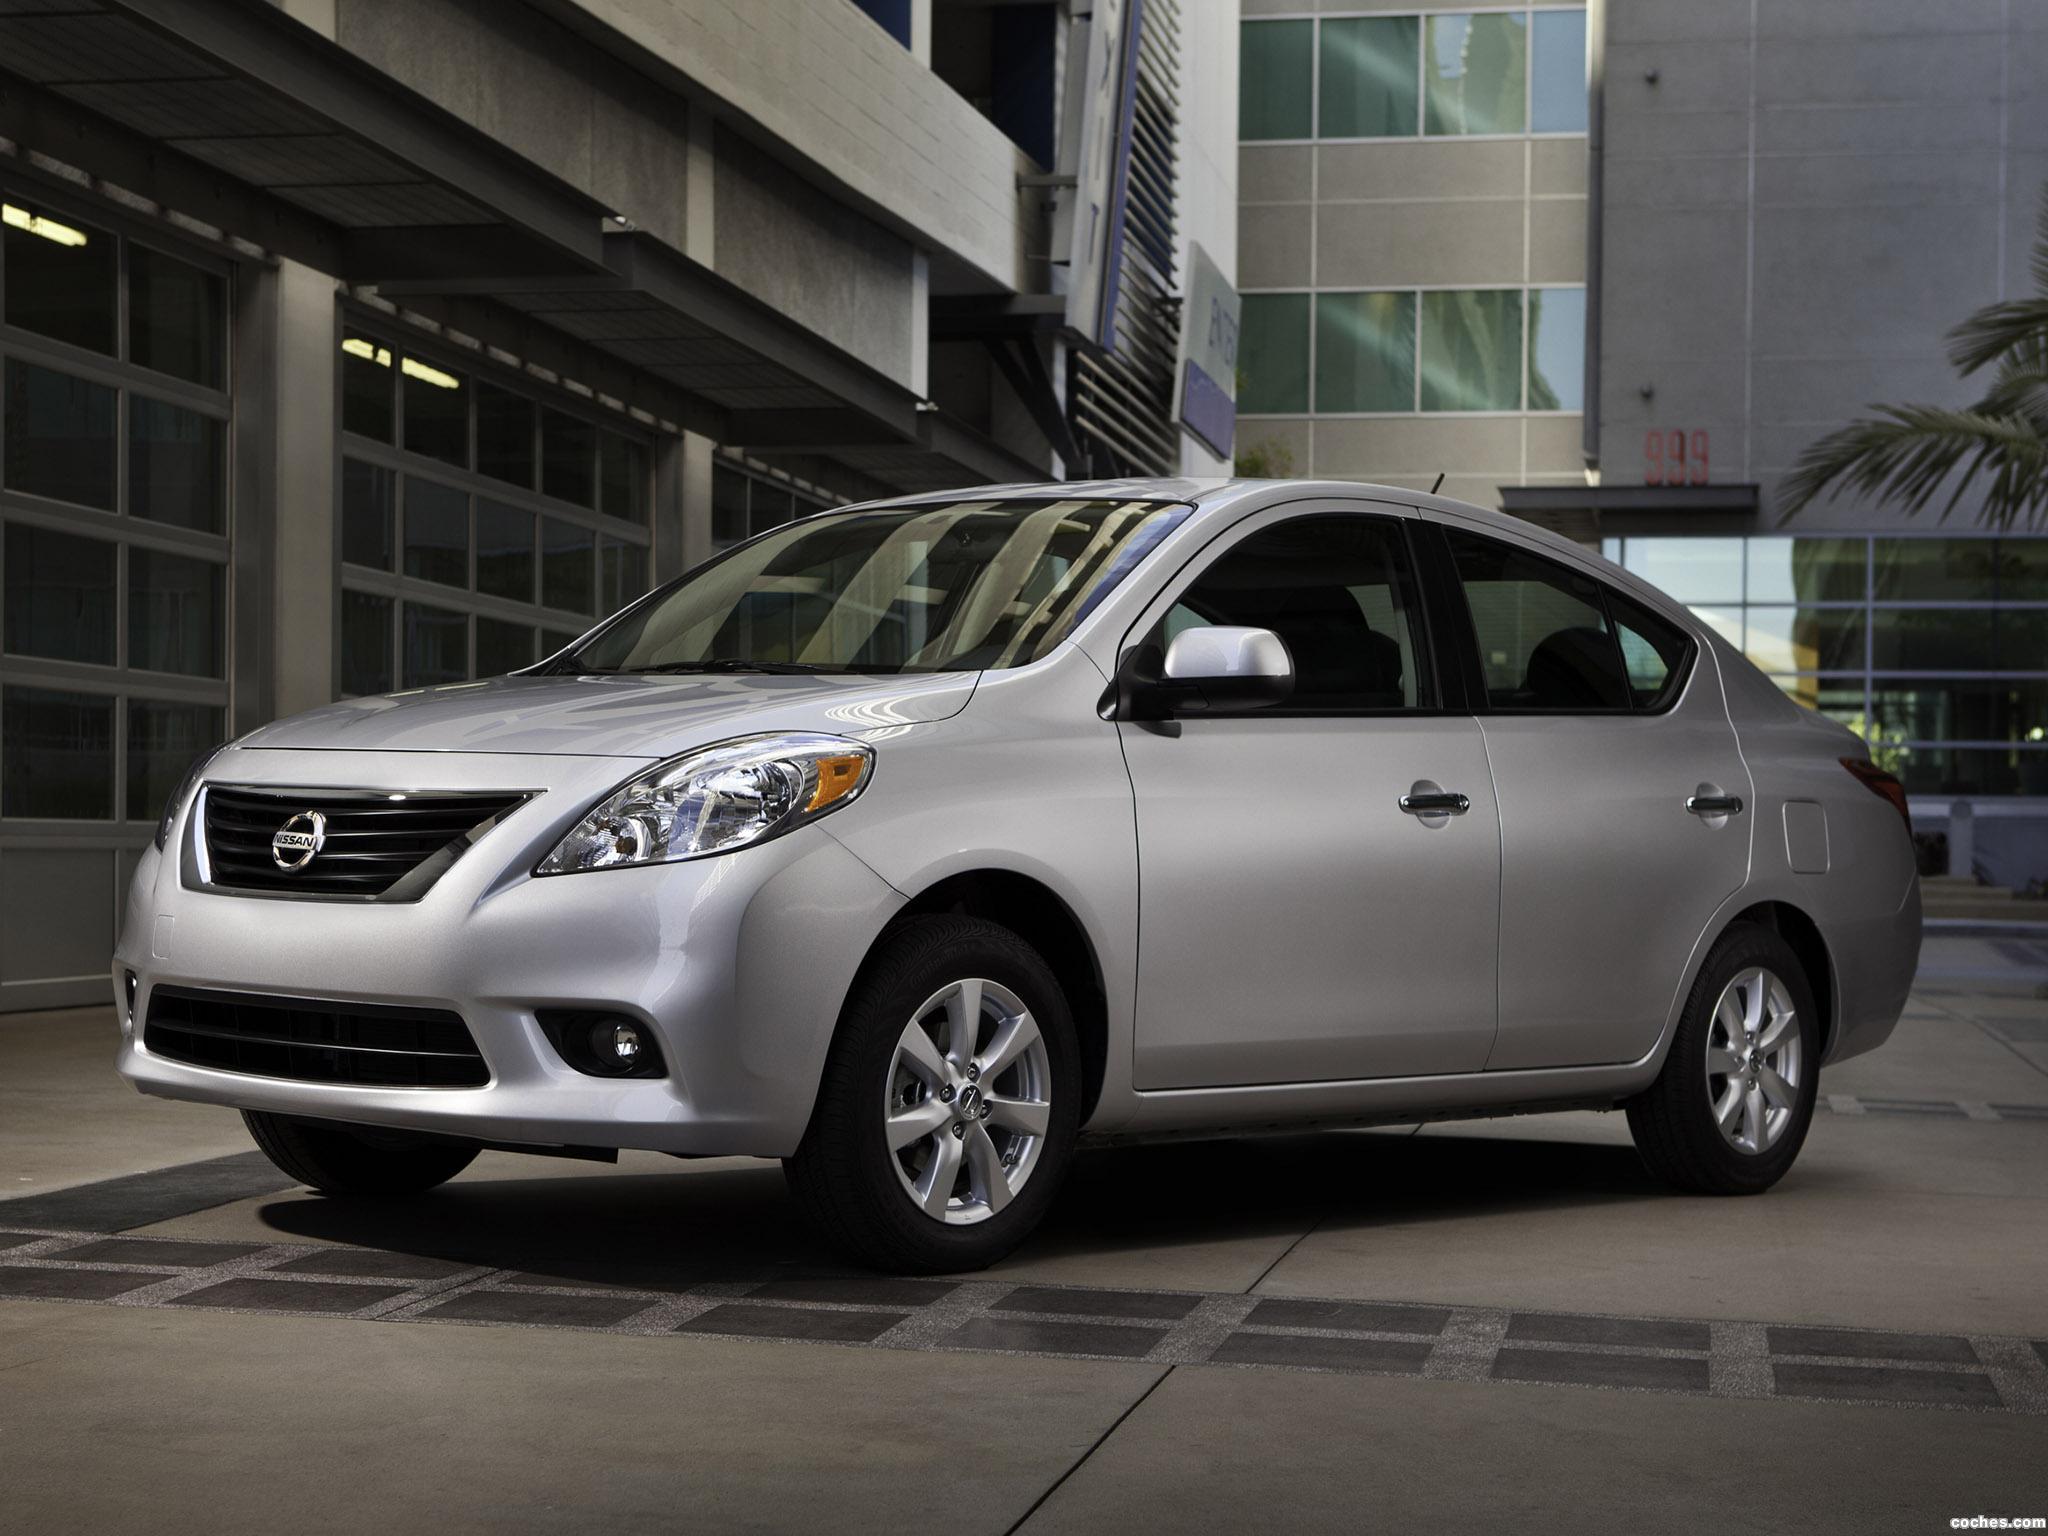 Foto 0 de Nissan Versa 2011